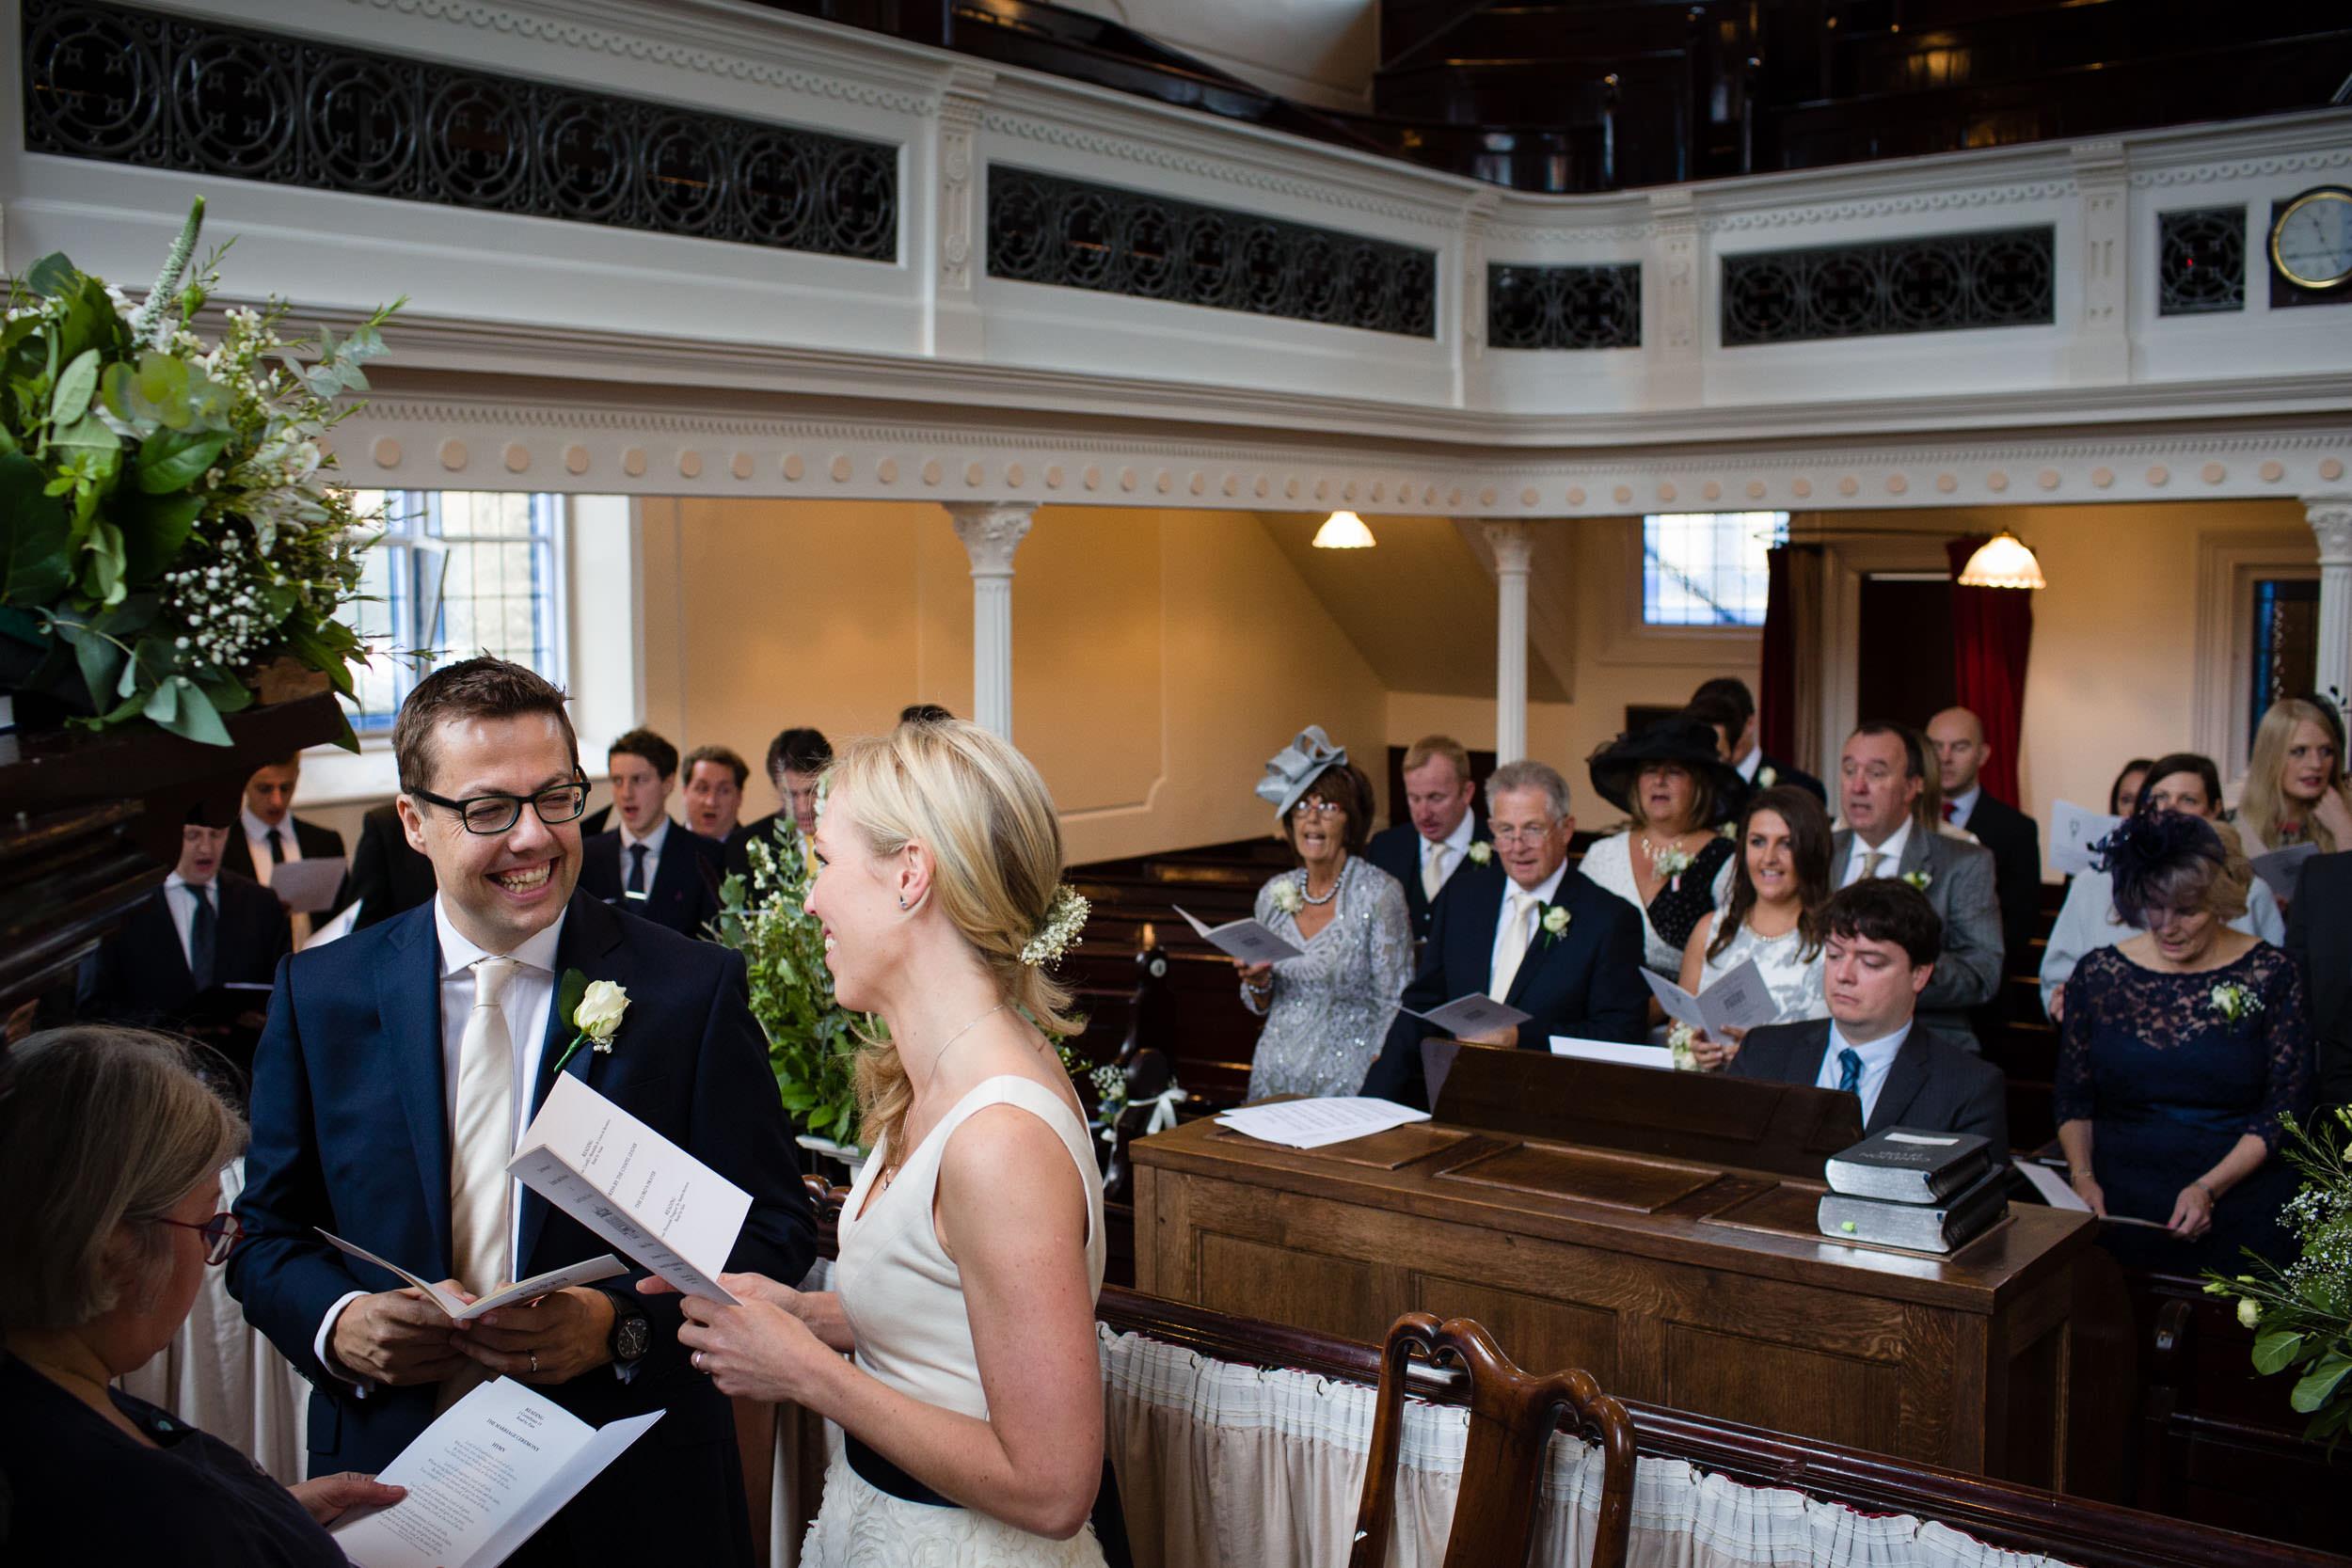 Best London Wedding Photographer Welsh Chapel Borough - James Sturcke | sturcke.org